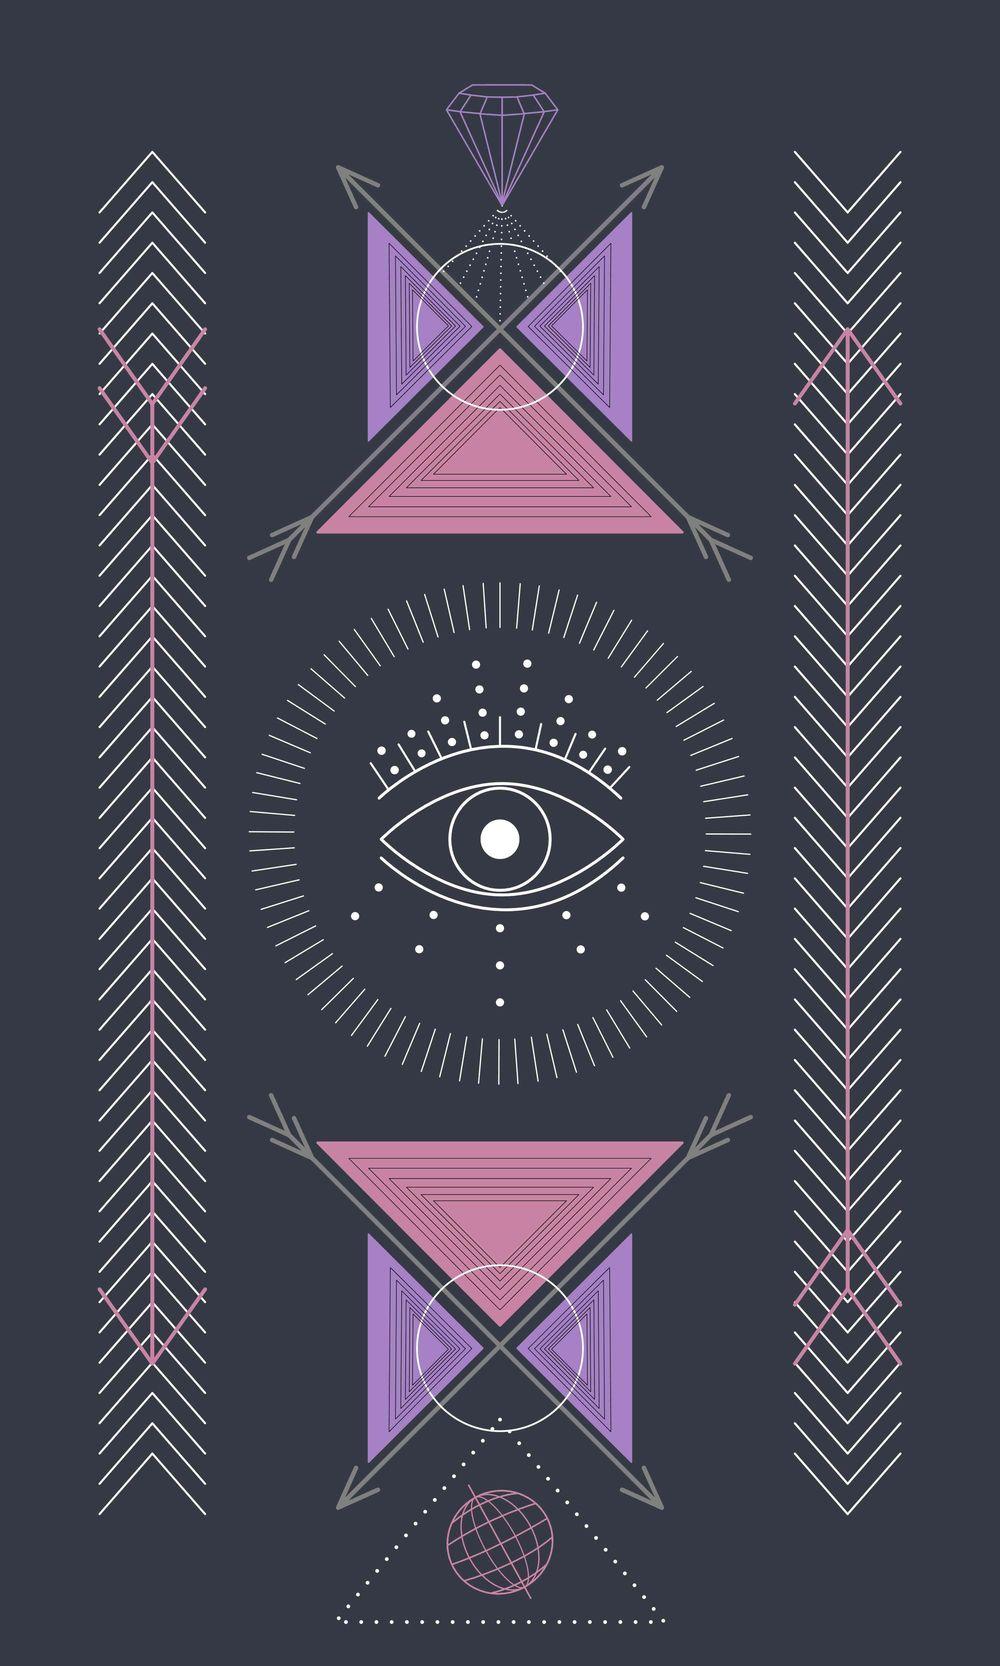 Geometric design - image 2 - student project